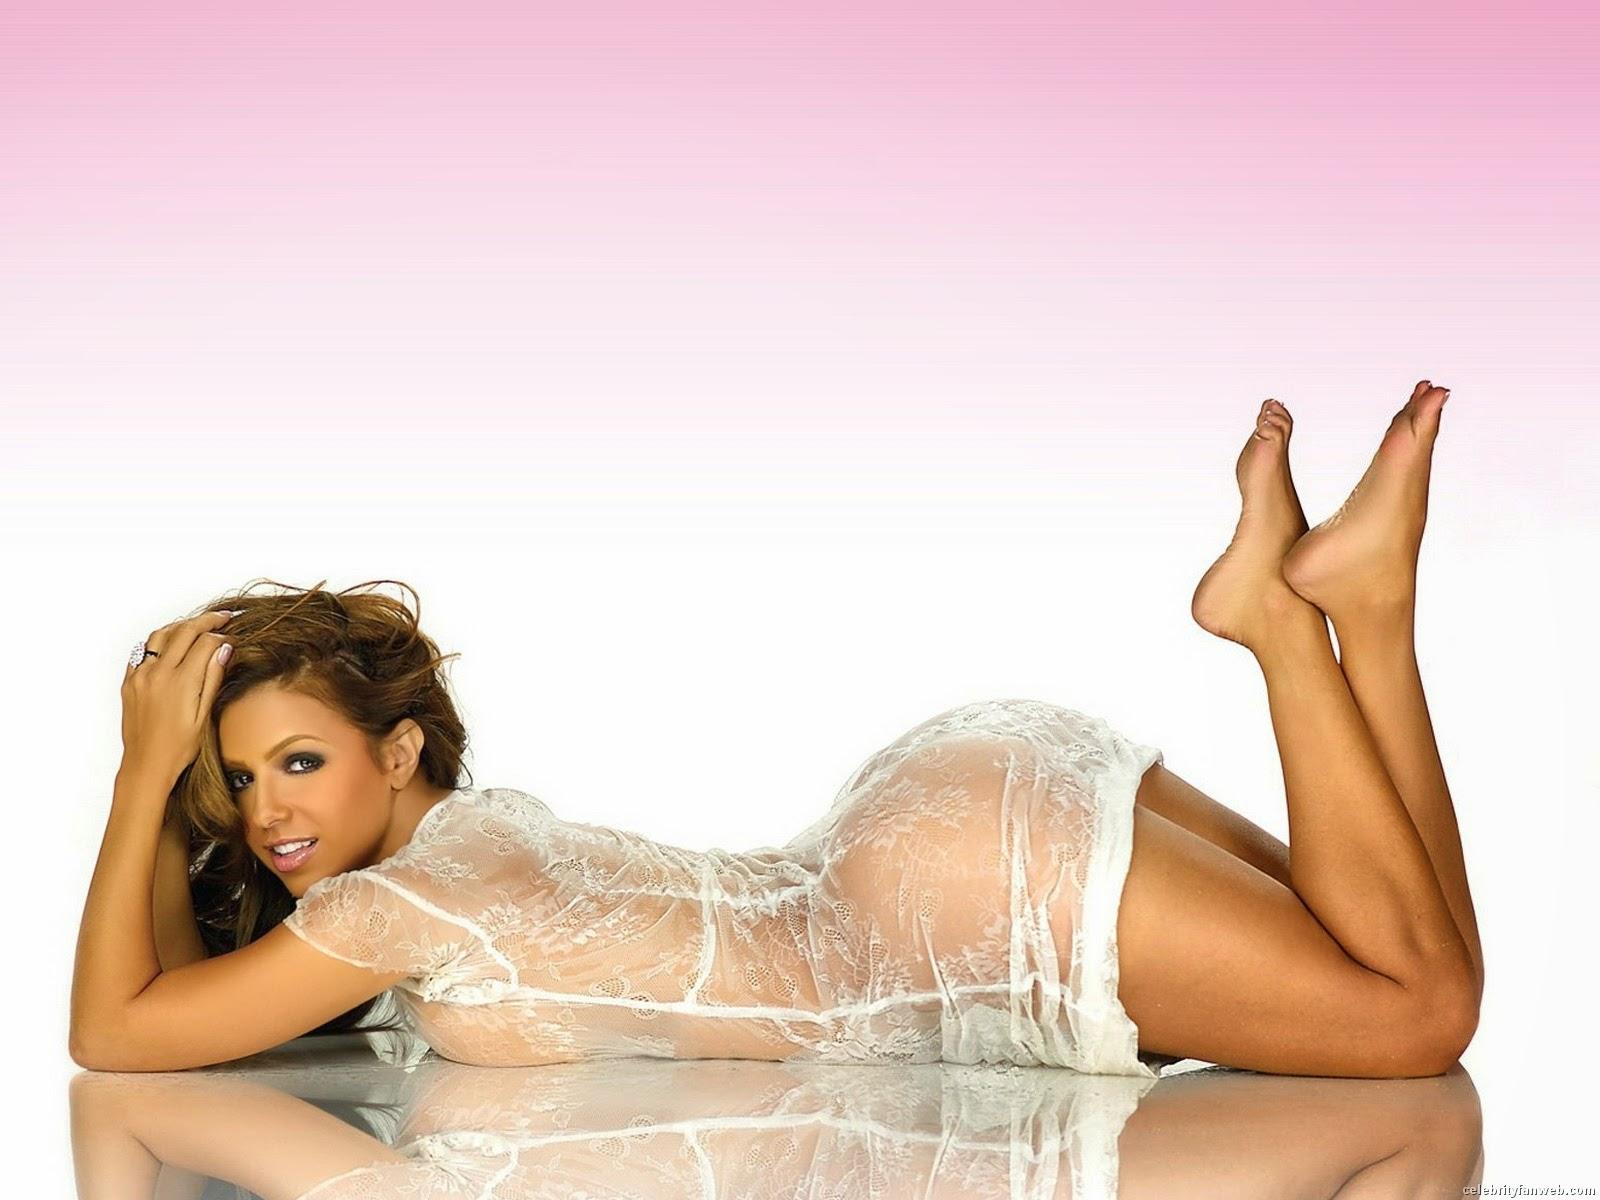 Hot Girls Wallpapers - Free Entertainment News